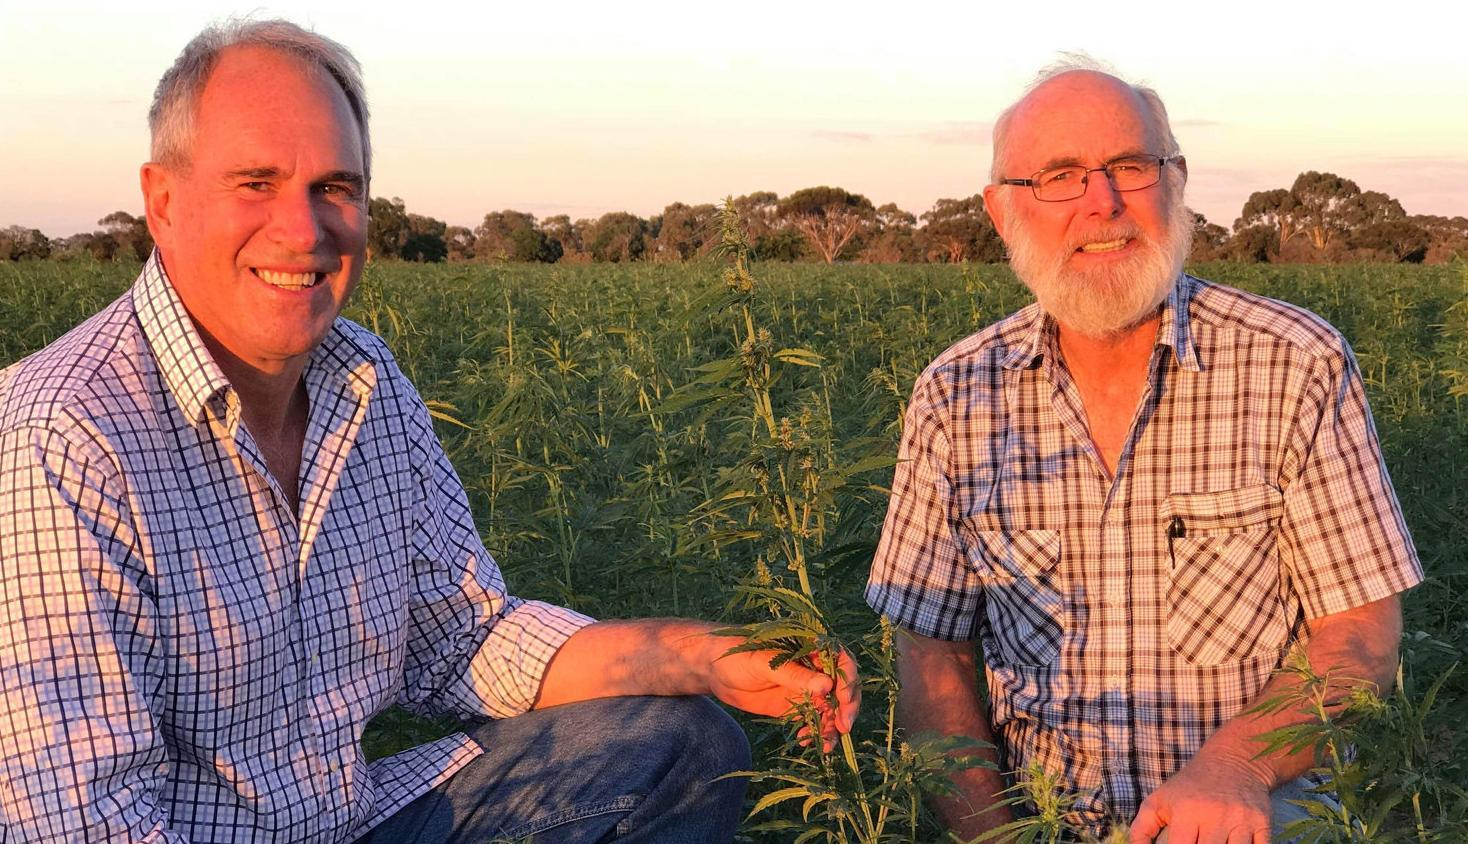 Group seeking hemp growers